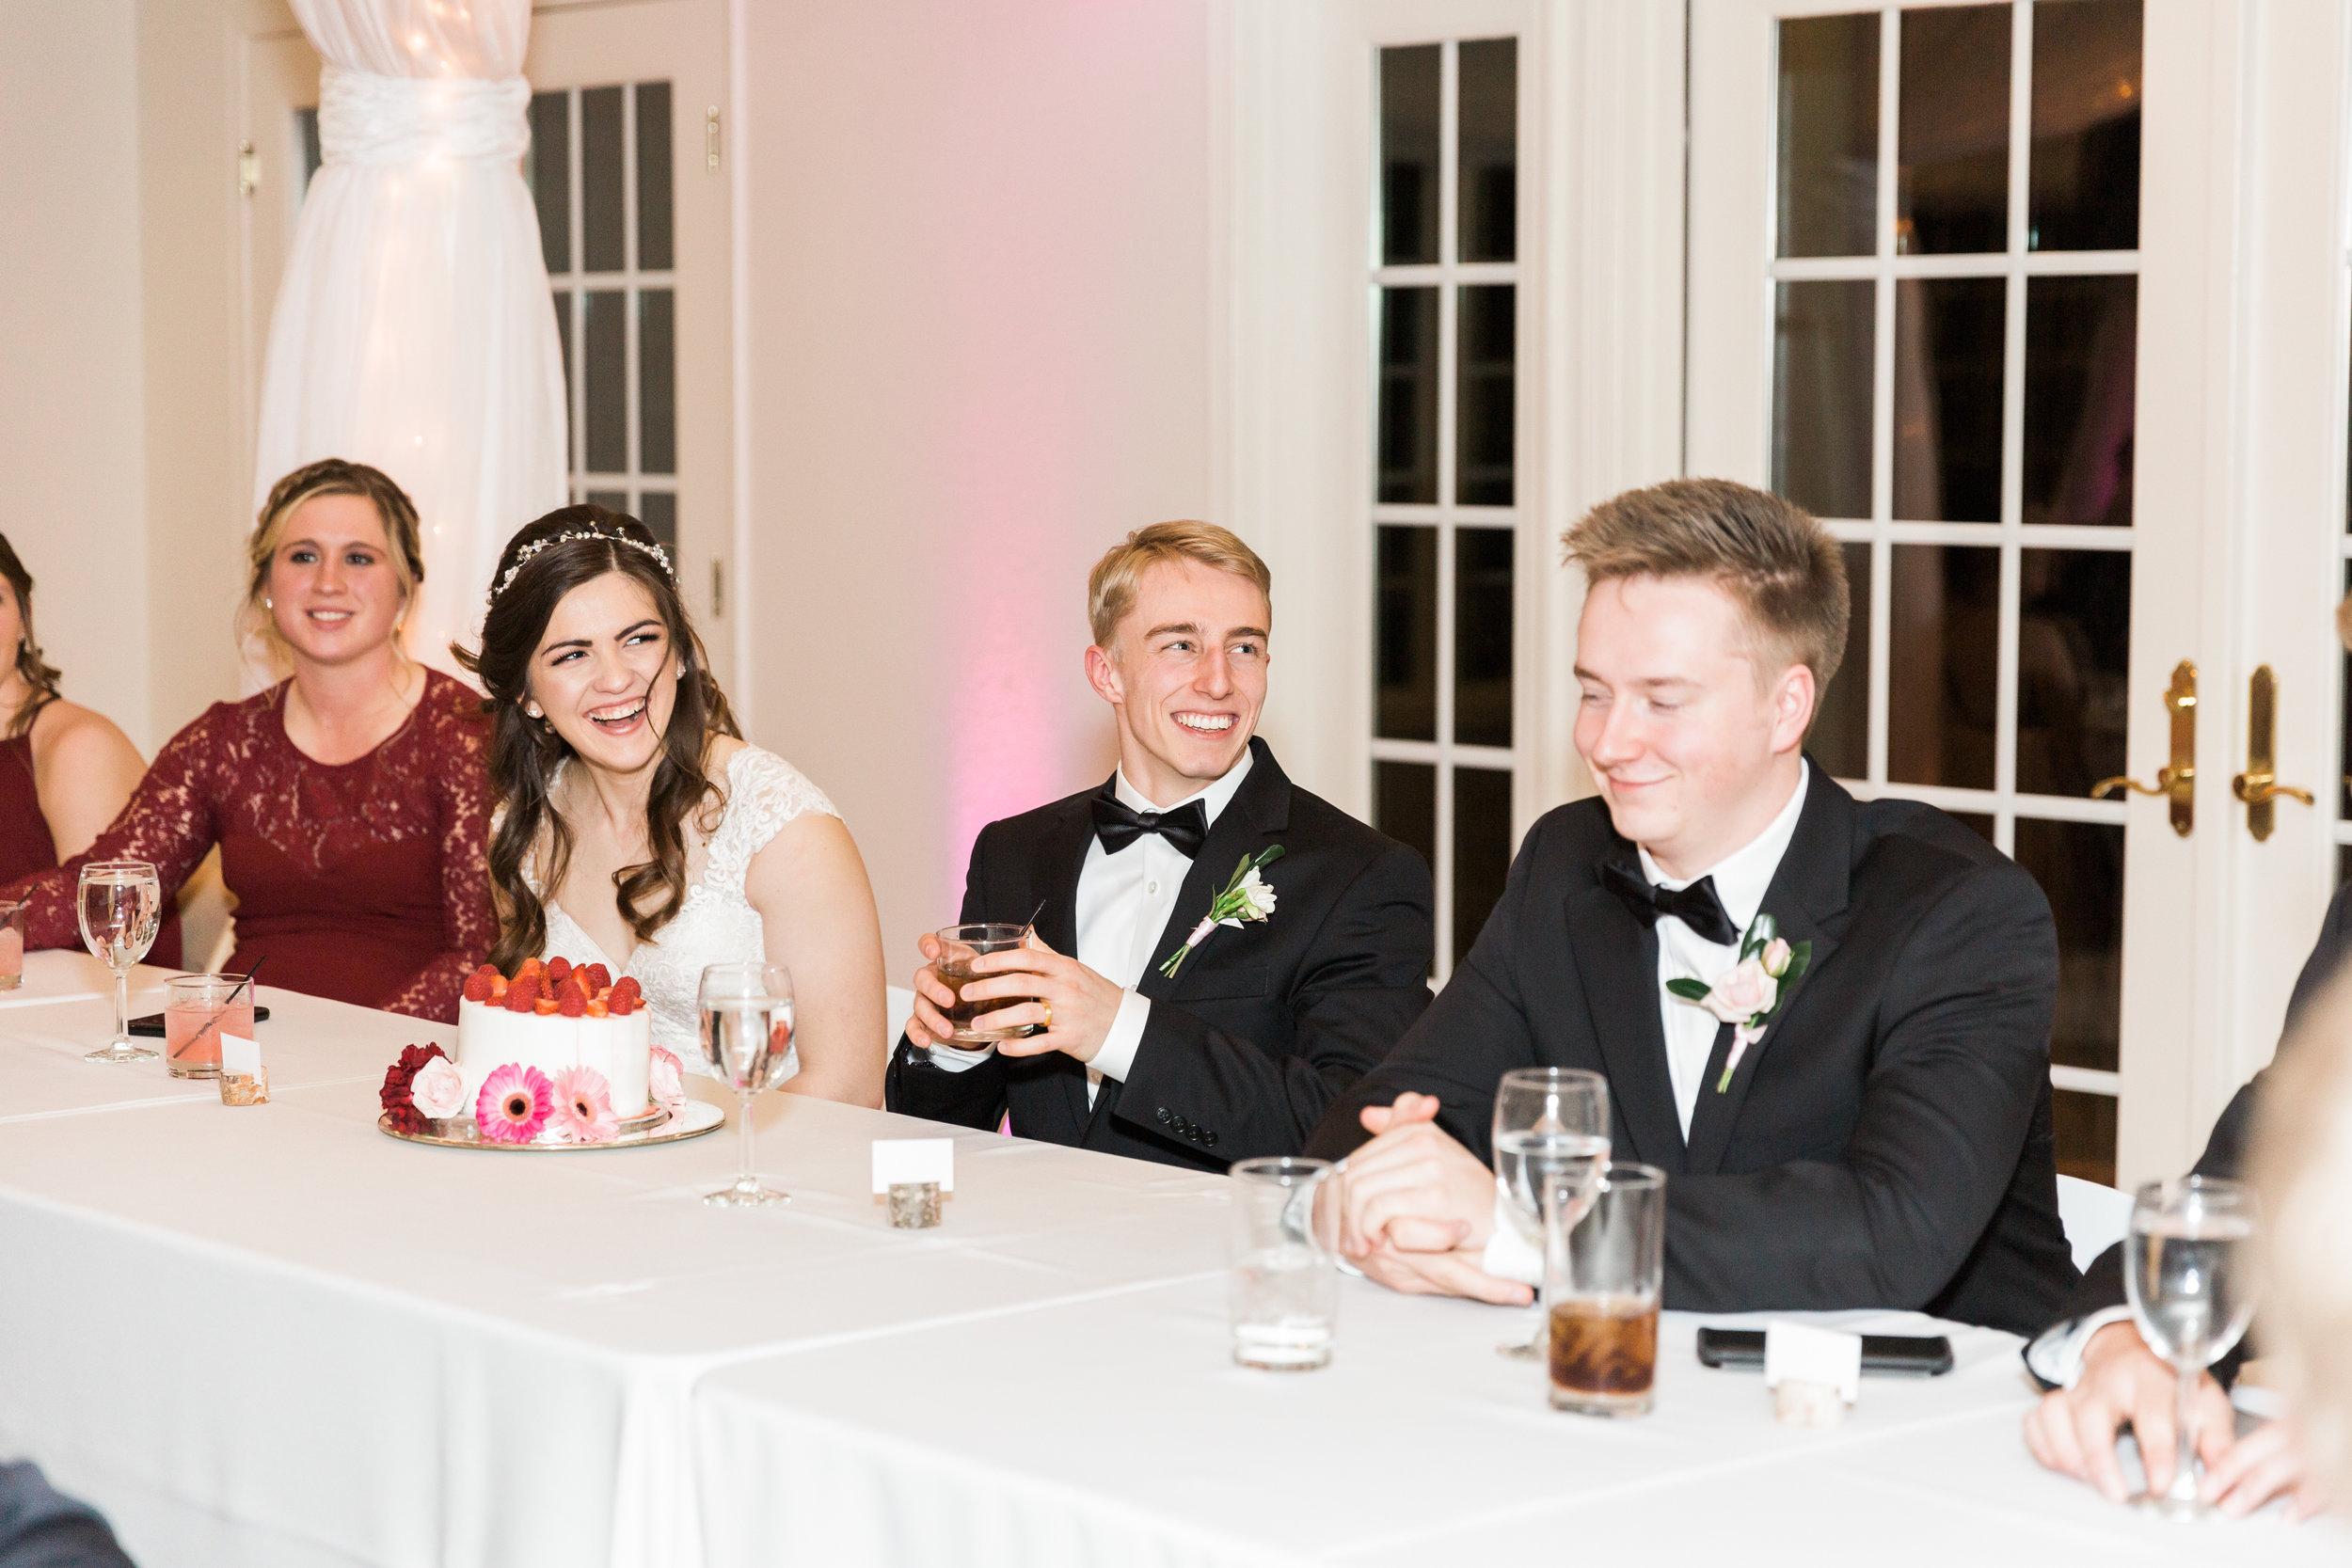 romanticcoloradodestinationwedding-51.jpg